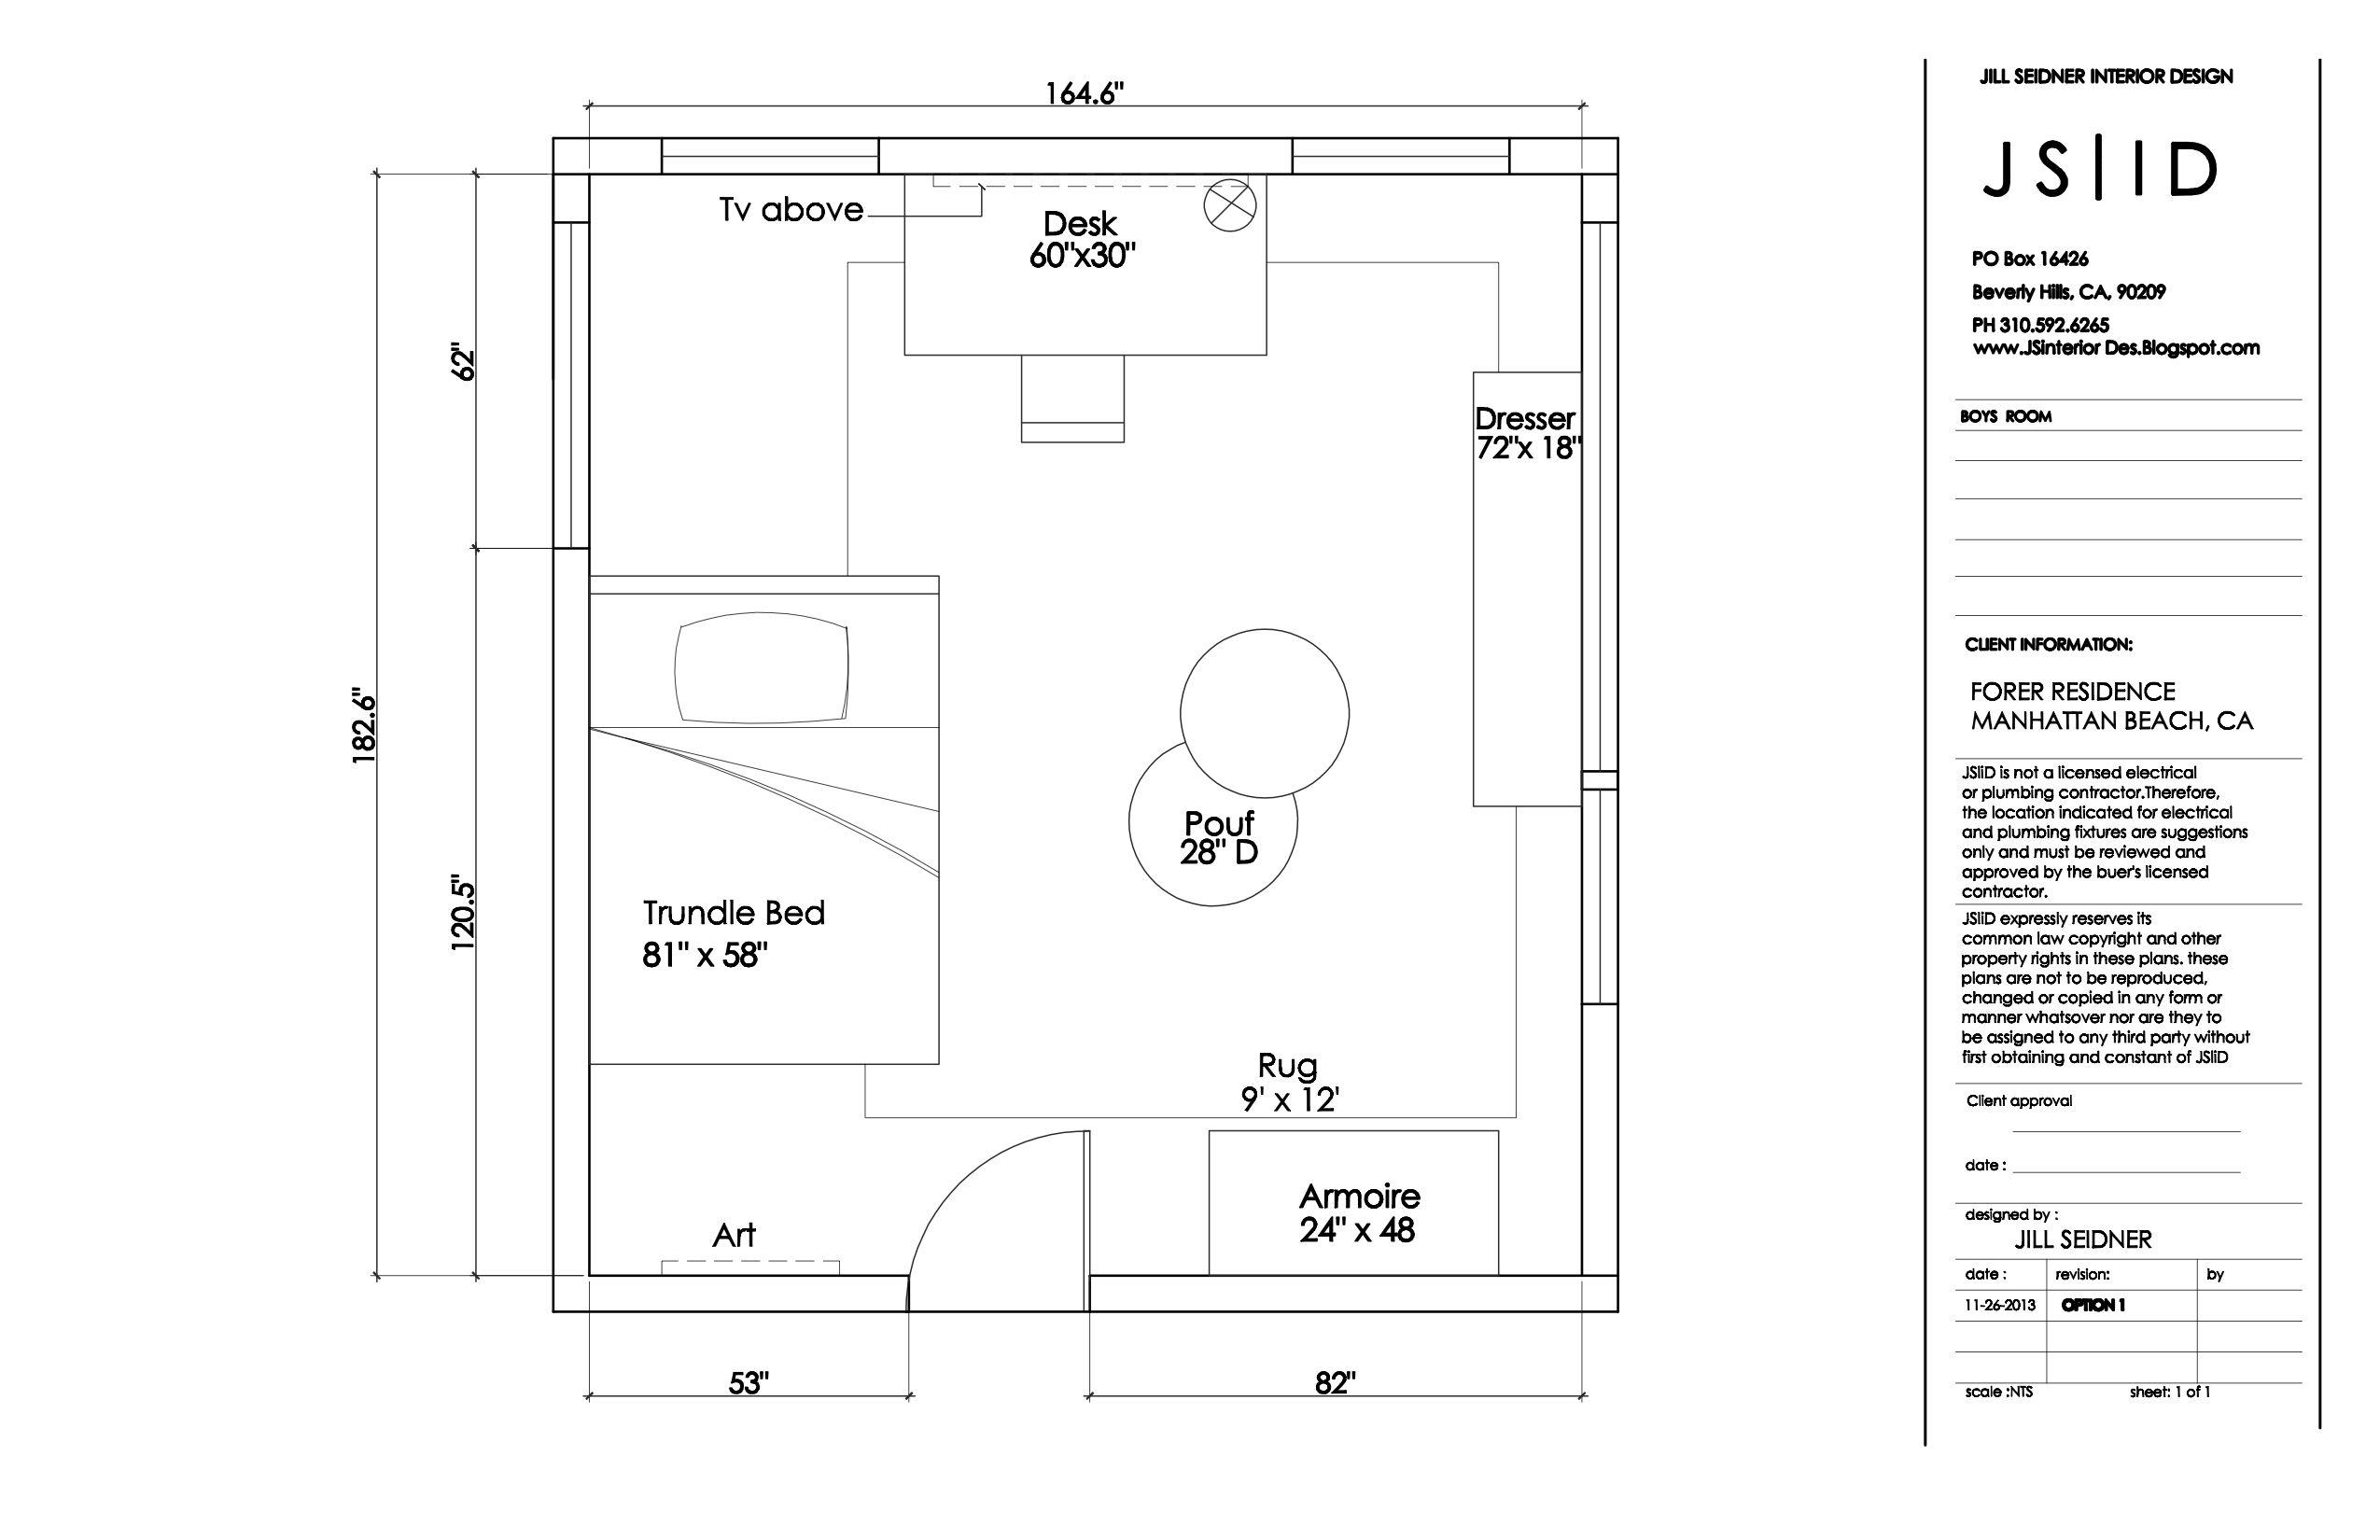 Manhattan Beach Ca Residence Boy S Bedroom Furniture Floor Plan Layout Option 2 Www Jsi Arranging Bedroom Furniture Boys Bedroom Furniture Floor Plan Layout